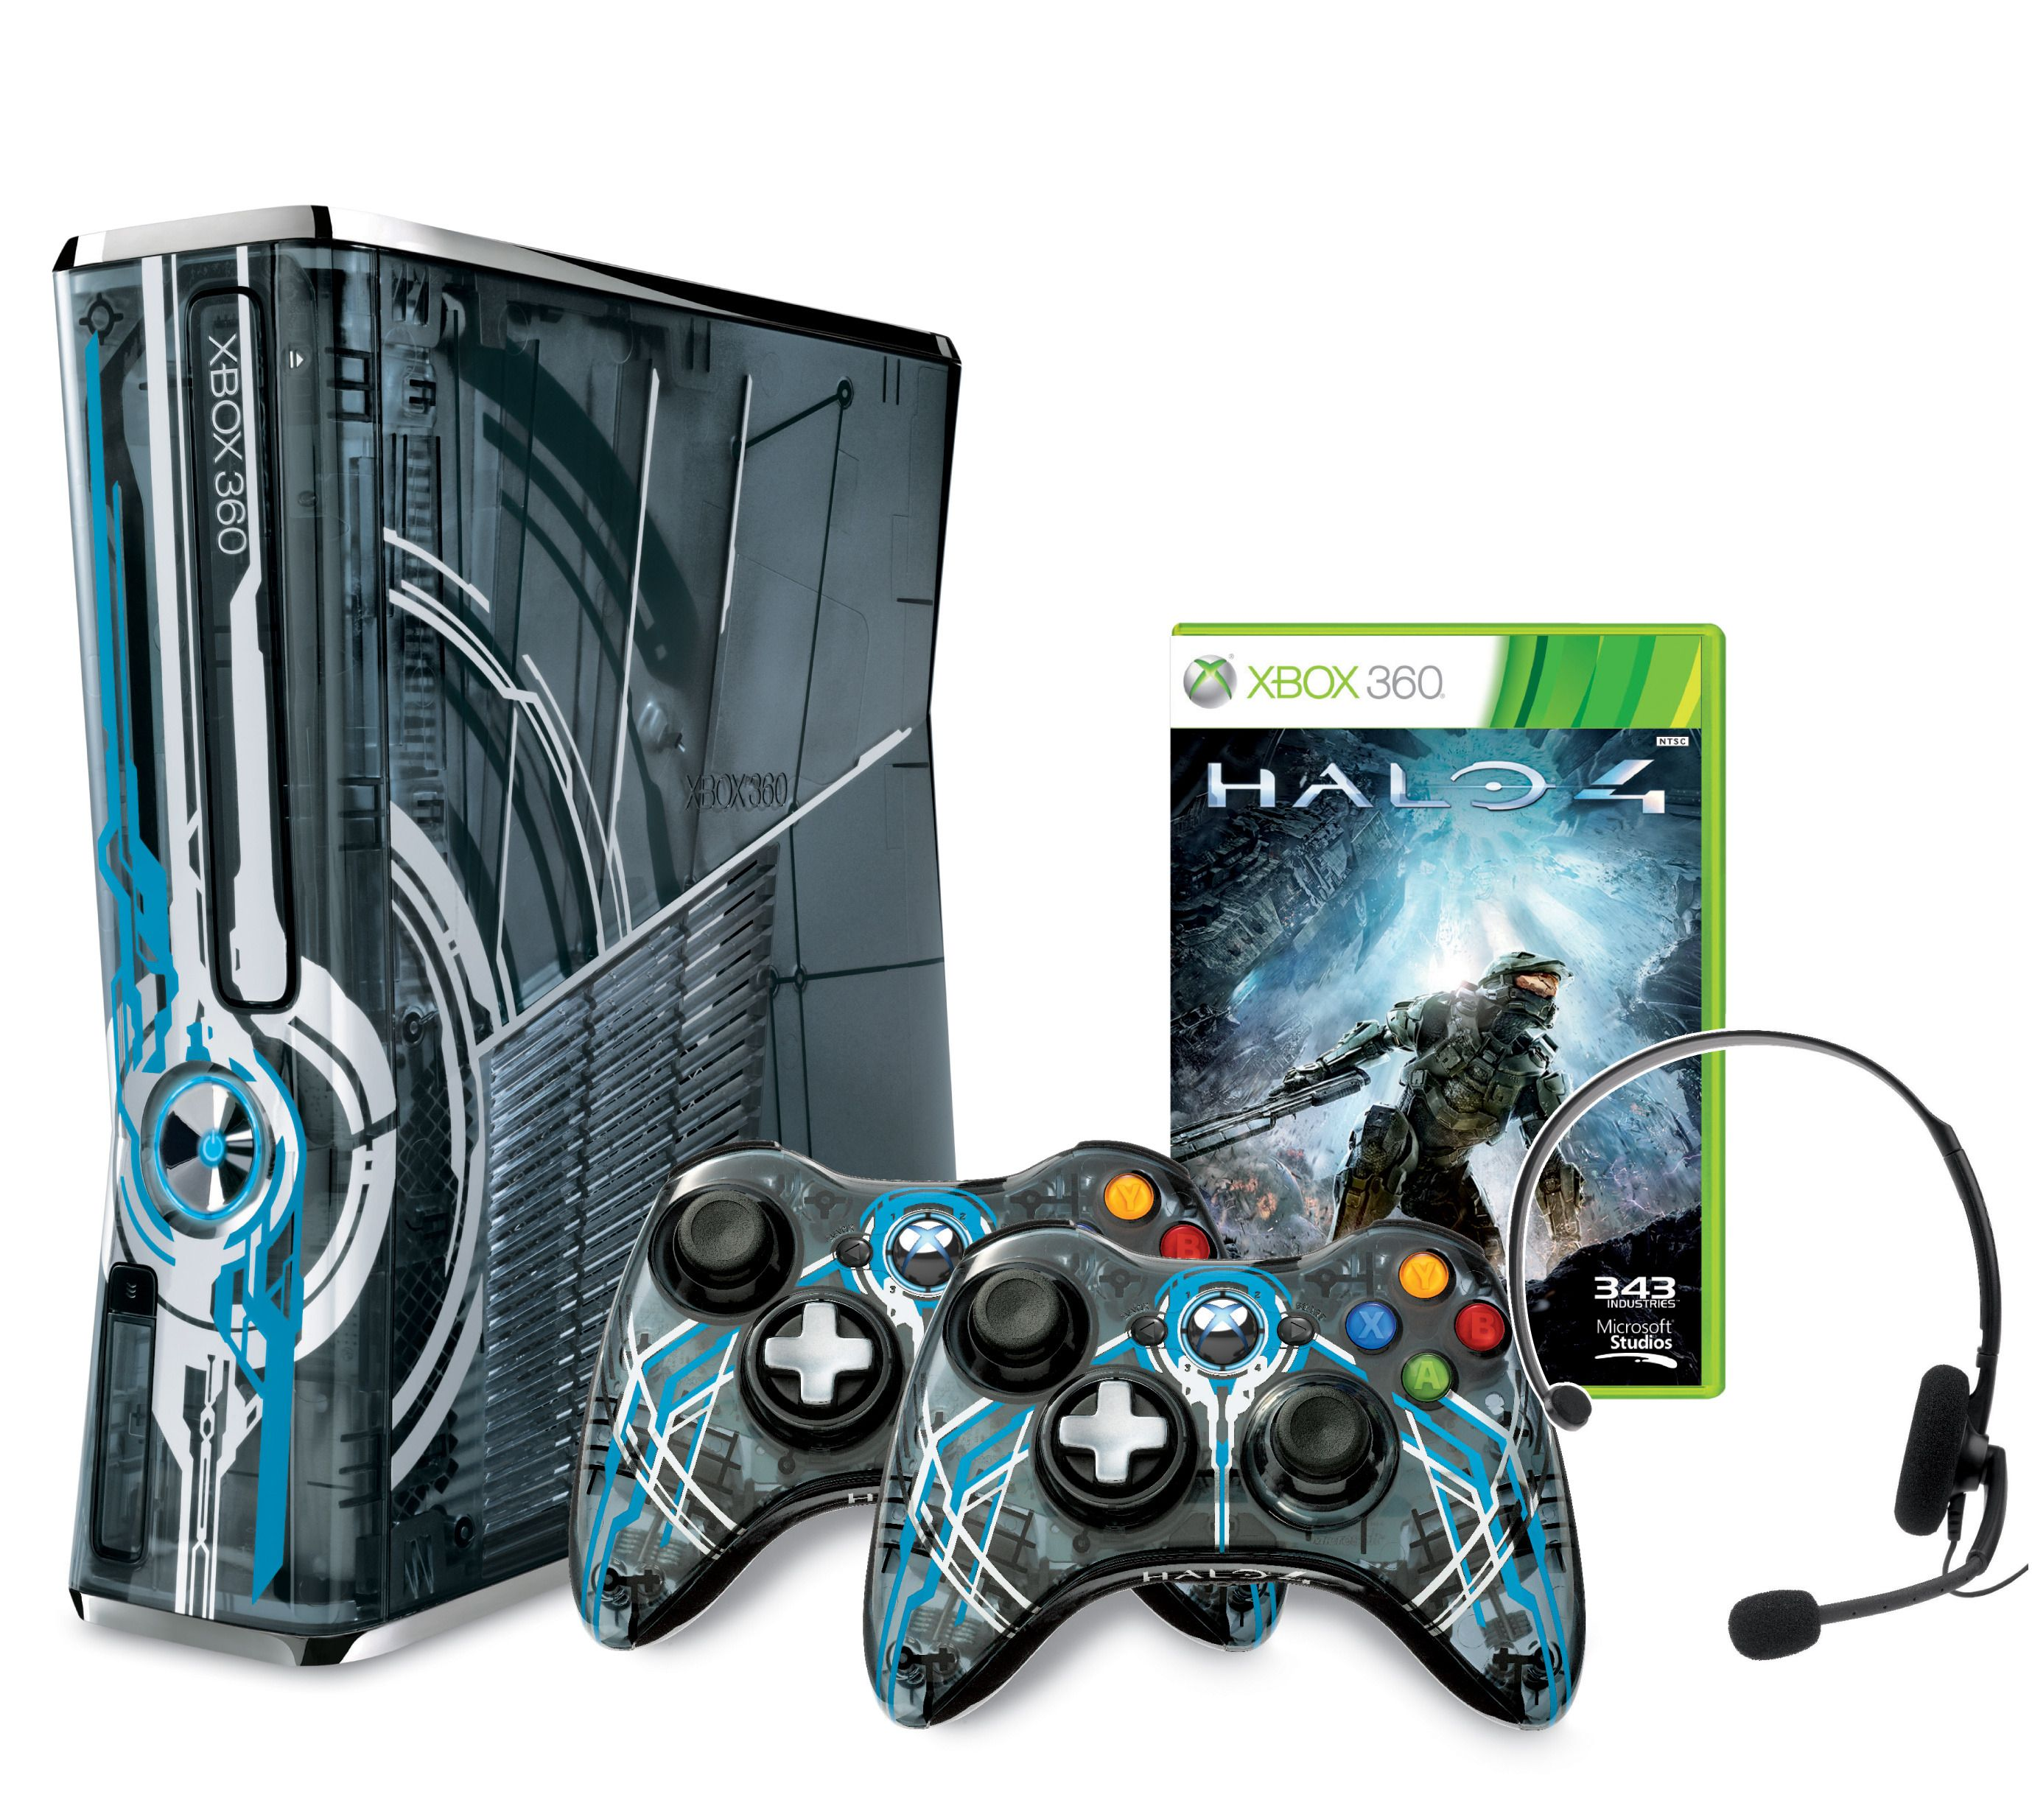 Xbox 360-konsoll med Halo 4-design, matchende kontrollere, headset og spill.Foto: Microsoft